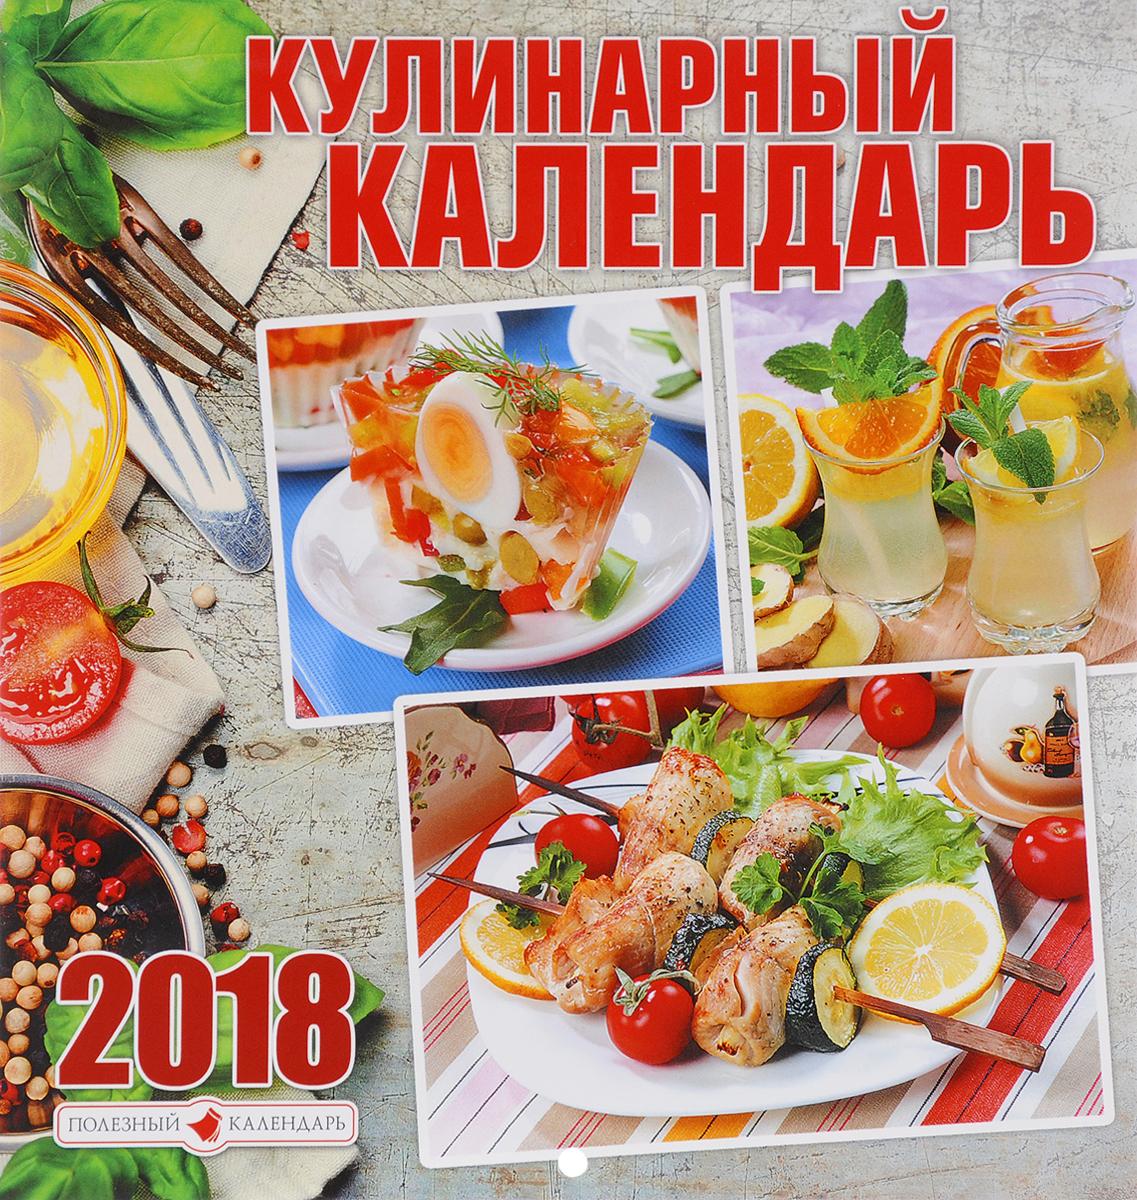 Календарь на 2018 год (на скрепке). Кулинарный календарь